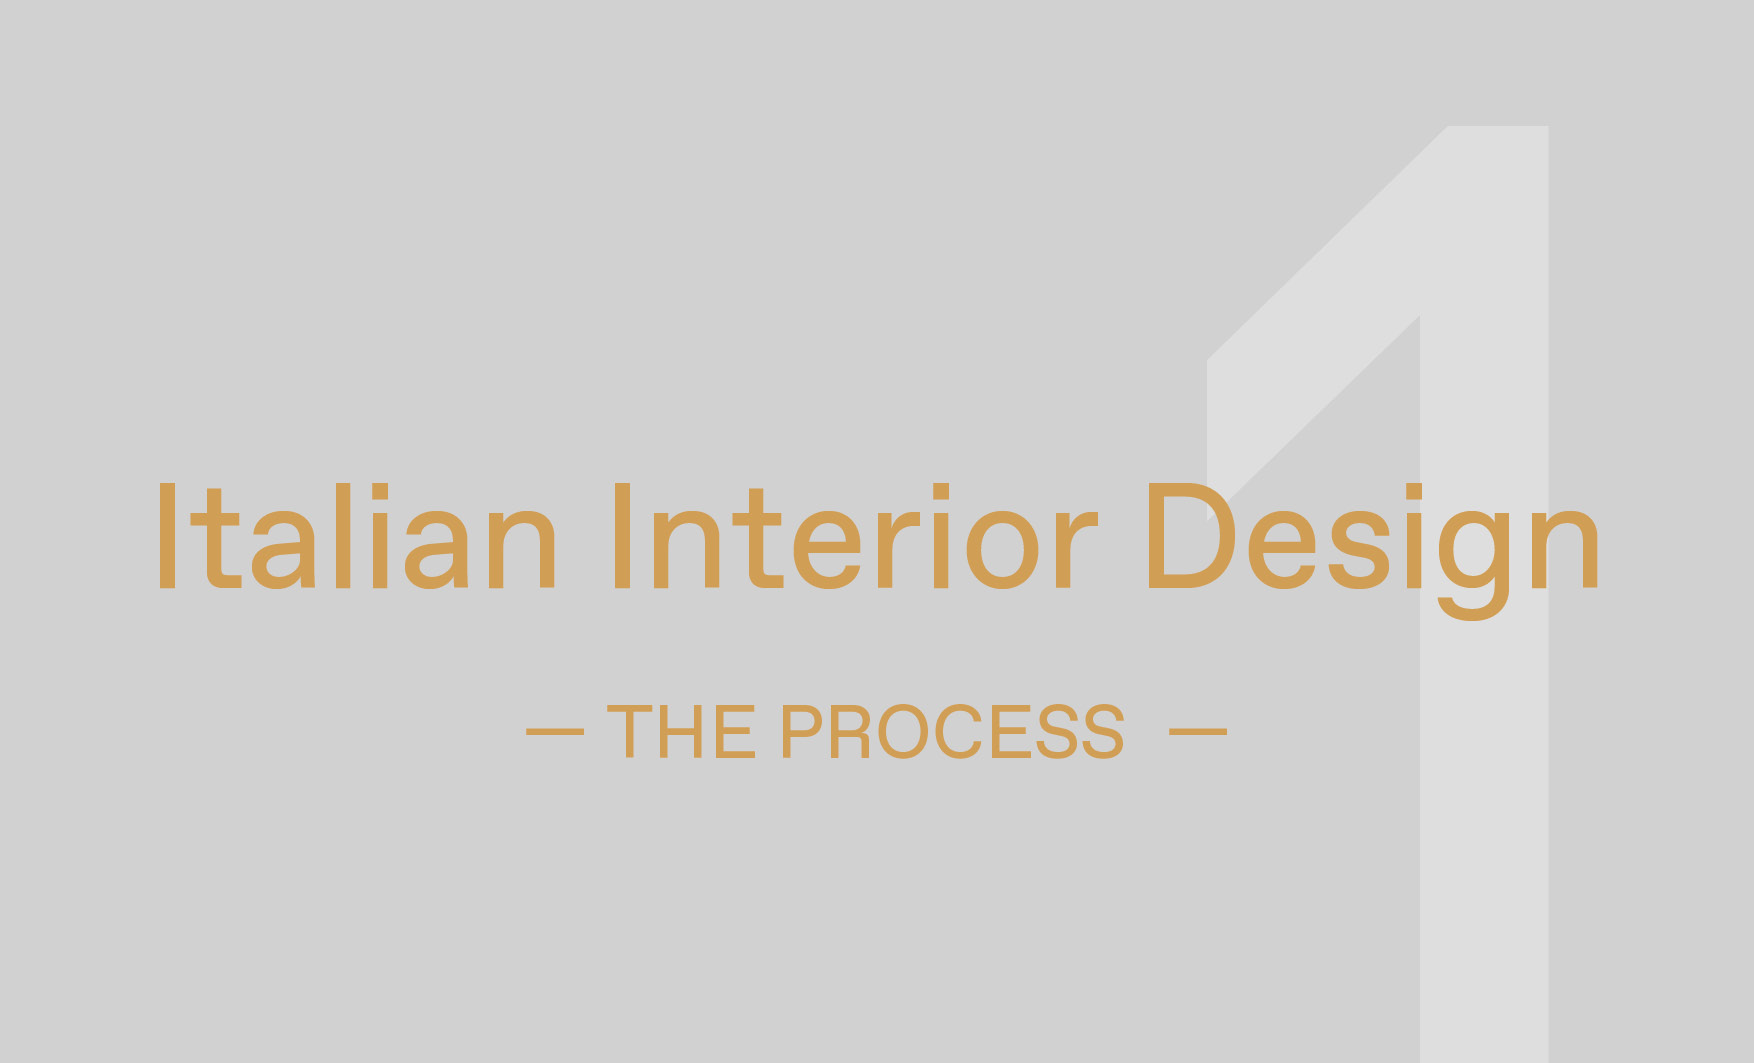 Interior Design Process Steps Part 1 Esperiri Milano,Palm Mehndi Beginner Easy Simple Mehndi Designs For Kids